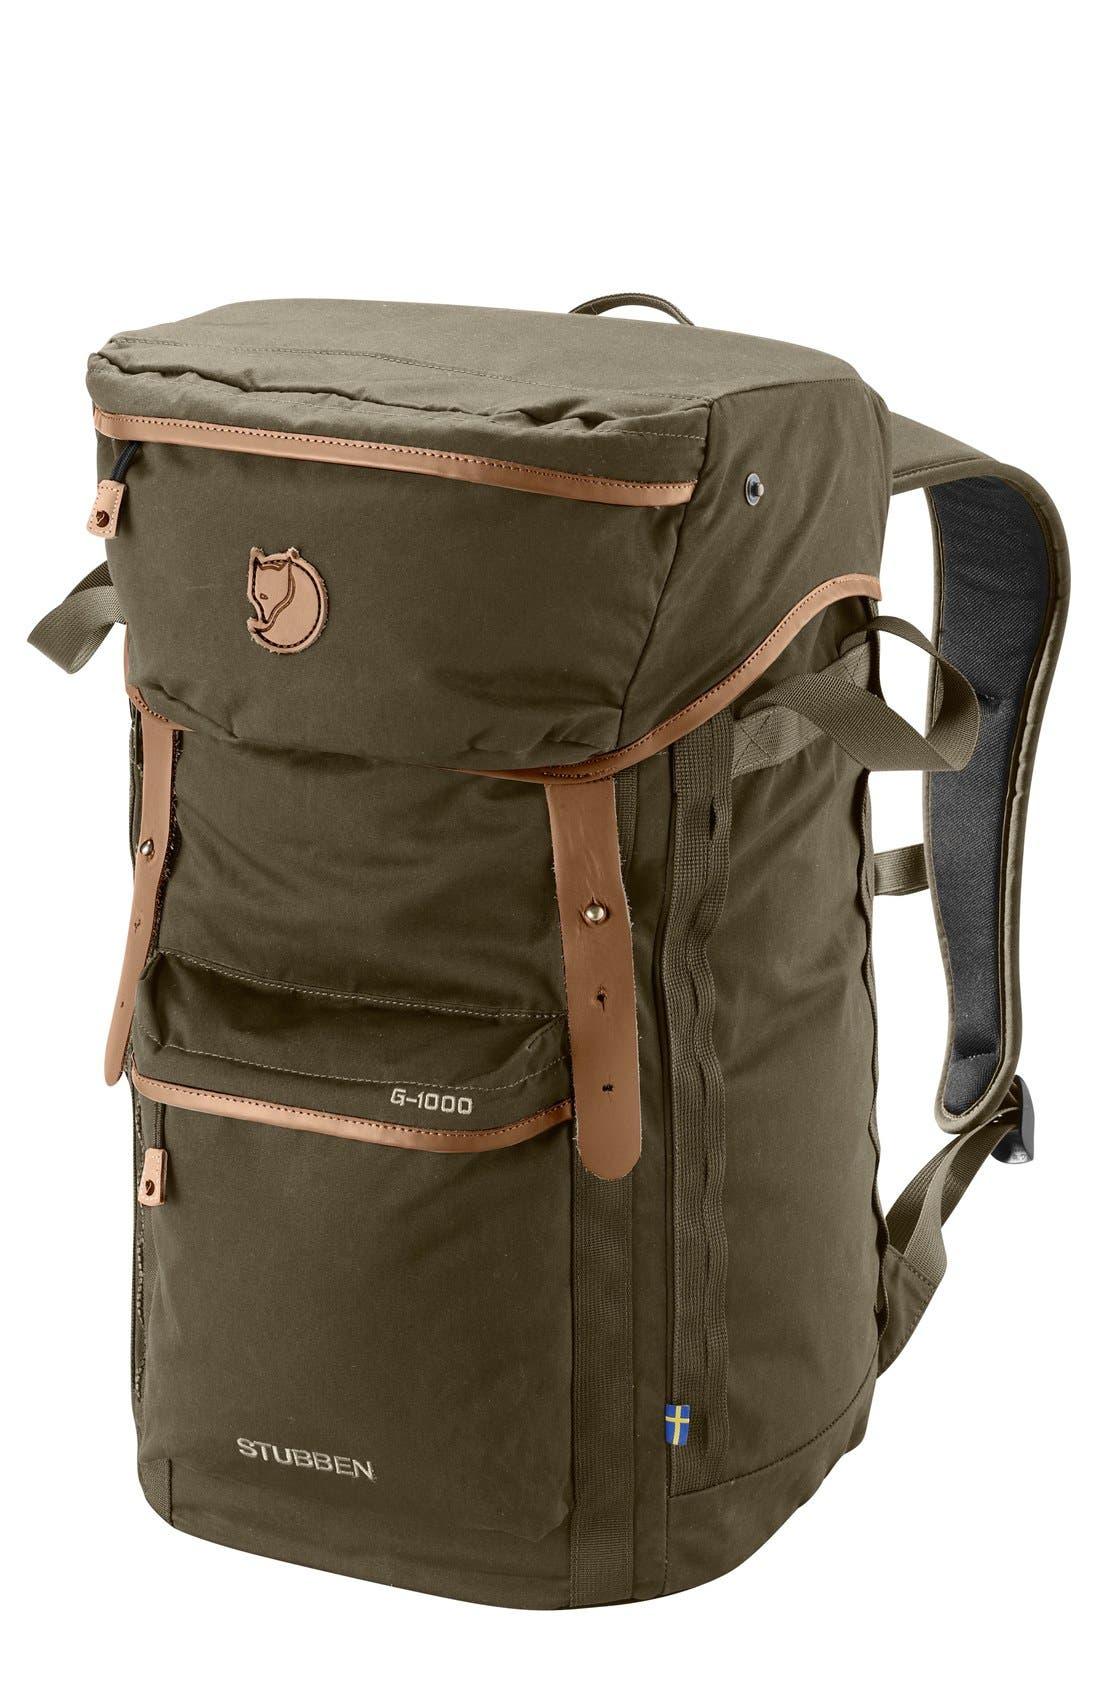 'Stubben' Backpack,                             Main thumbnail 1, color,                             Dark Olive